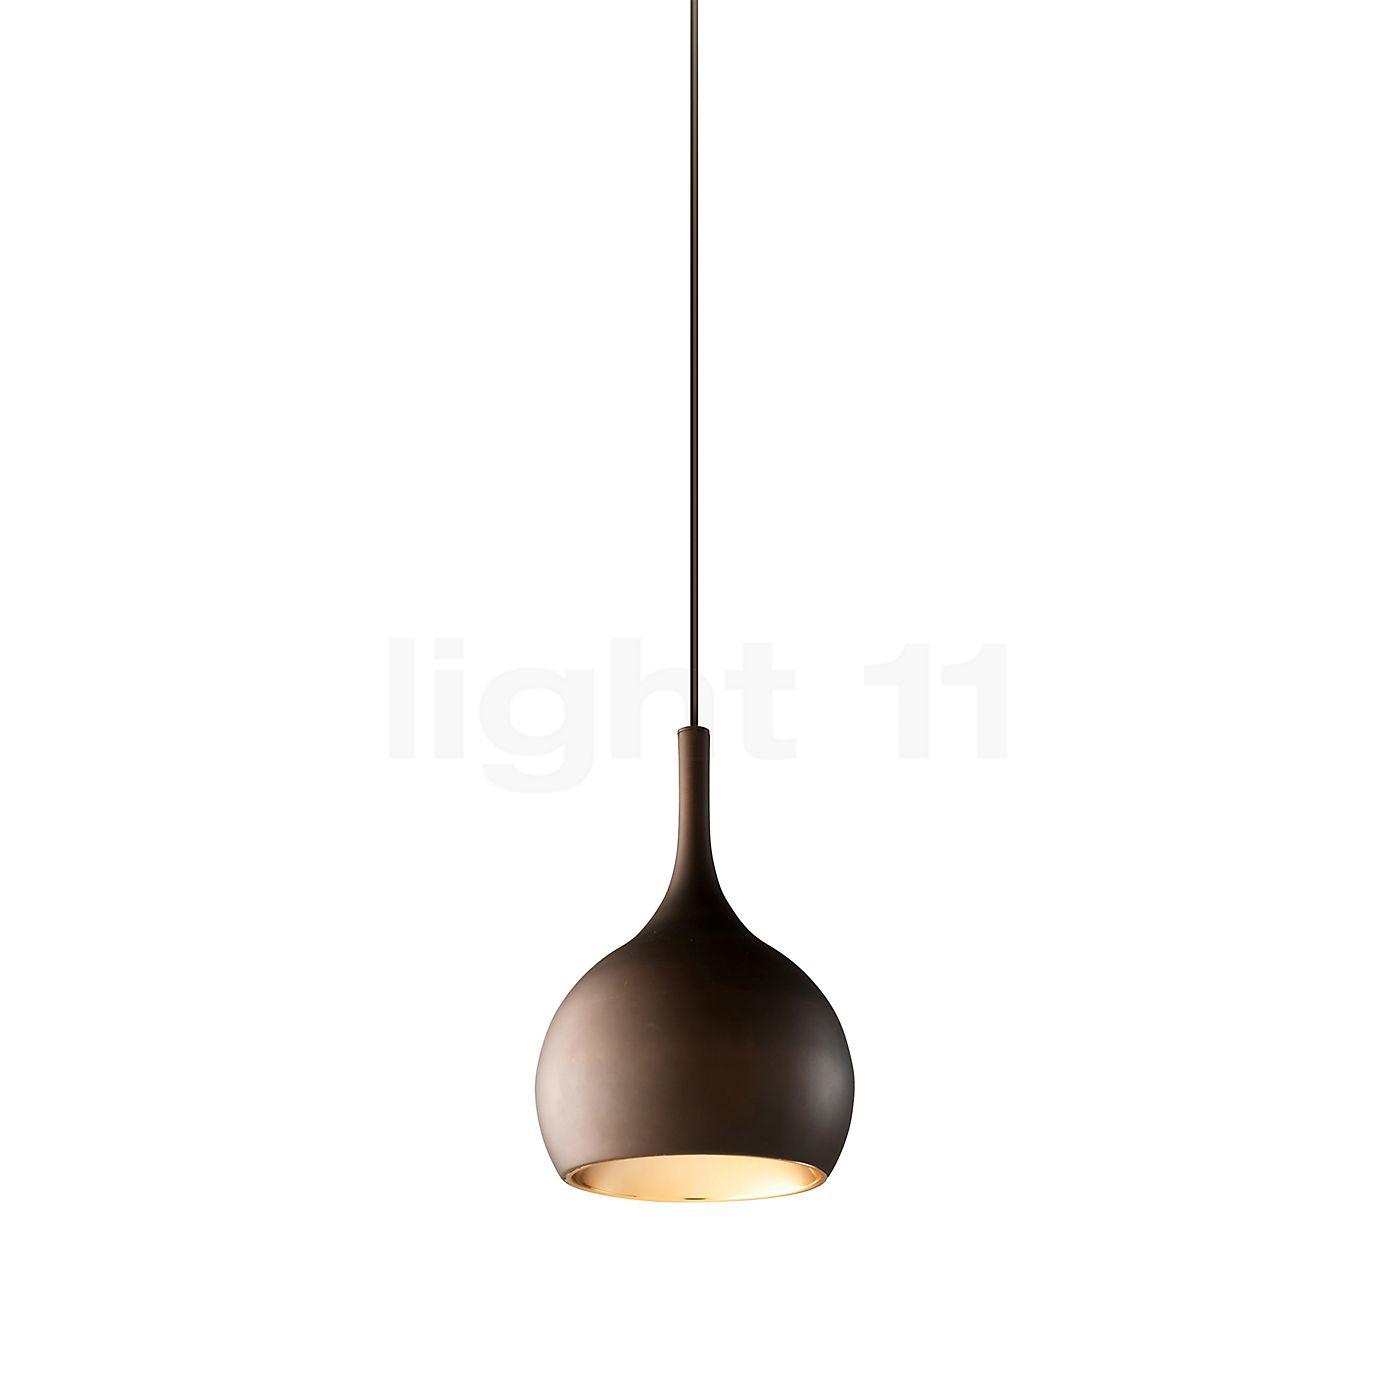 Leds C4 Sixties Drop Hanglamp Led Hanglamp Kopen Op Light11 Nl Hanglamp Led Licht